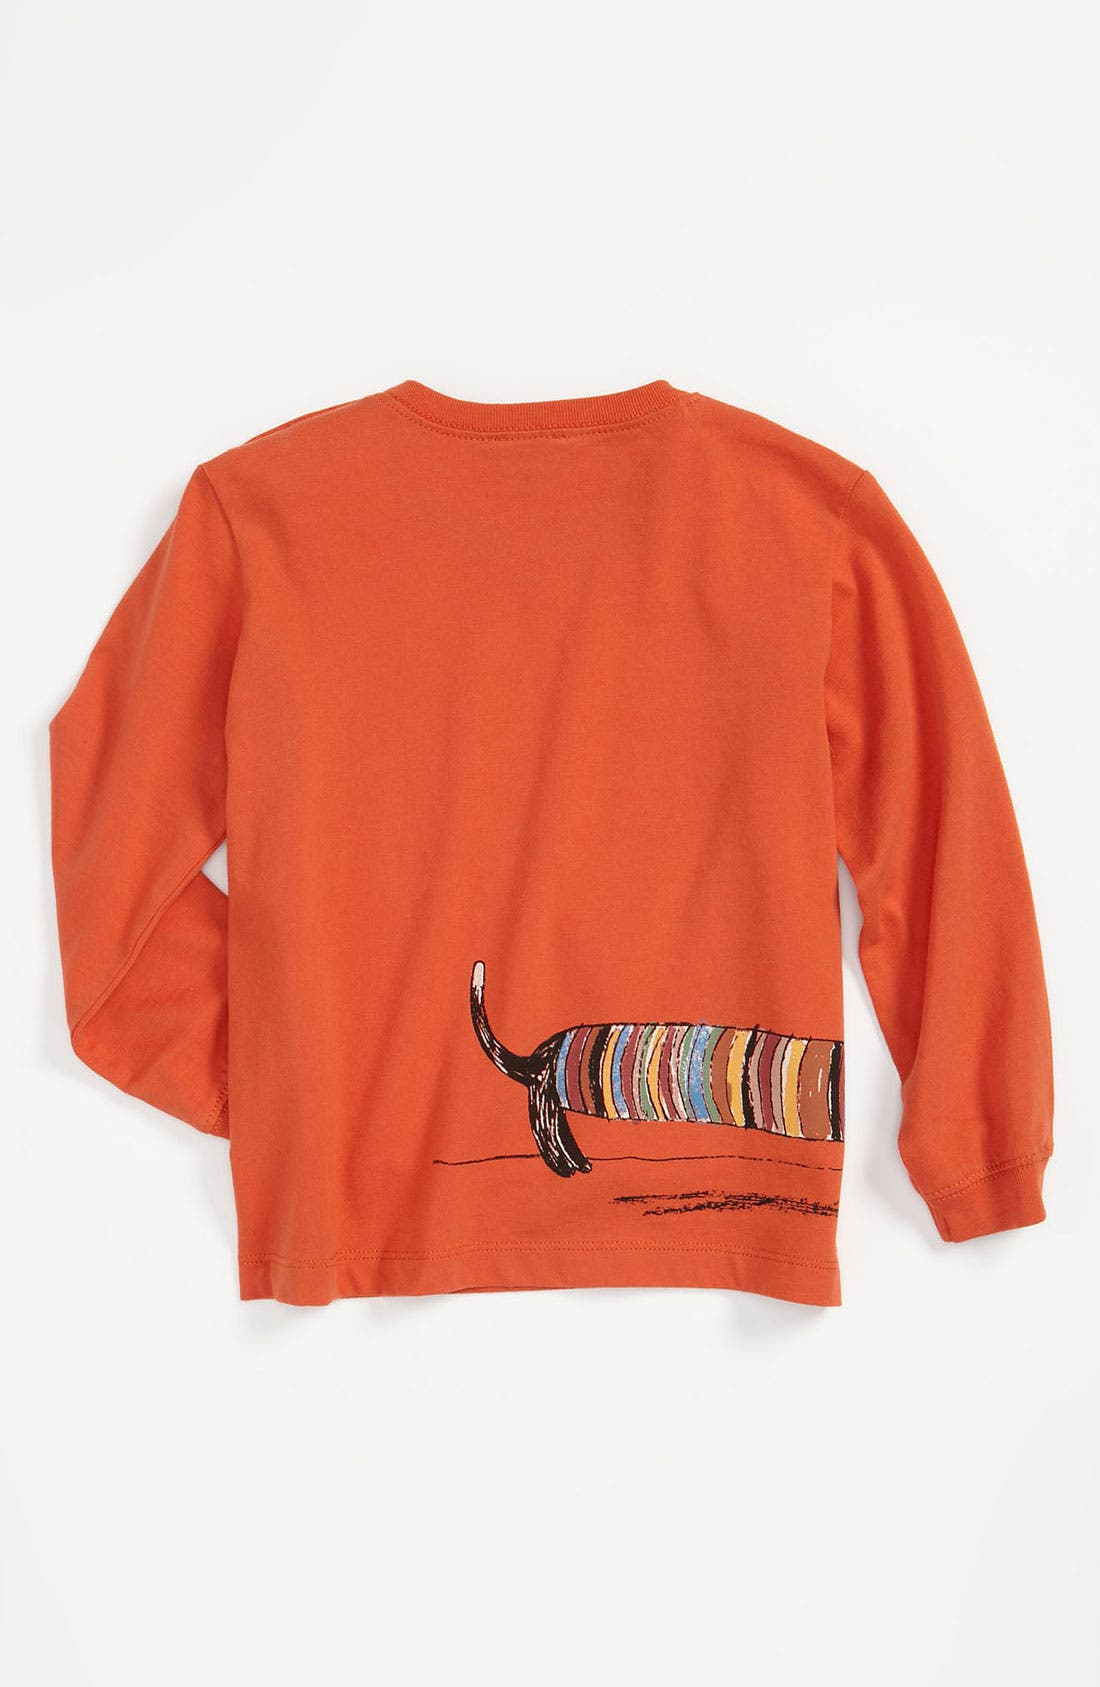 Alternate Image 2  - Paul Smith Junior 'Camillo' T-Shirt (Infant)